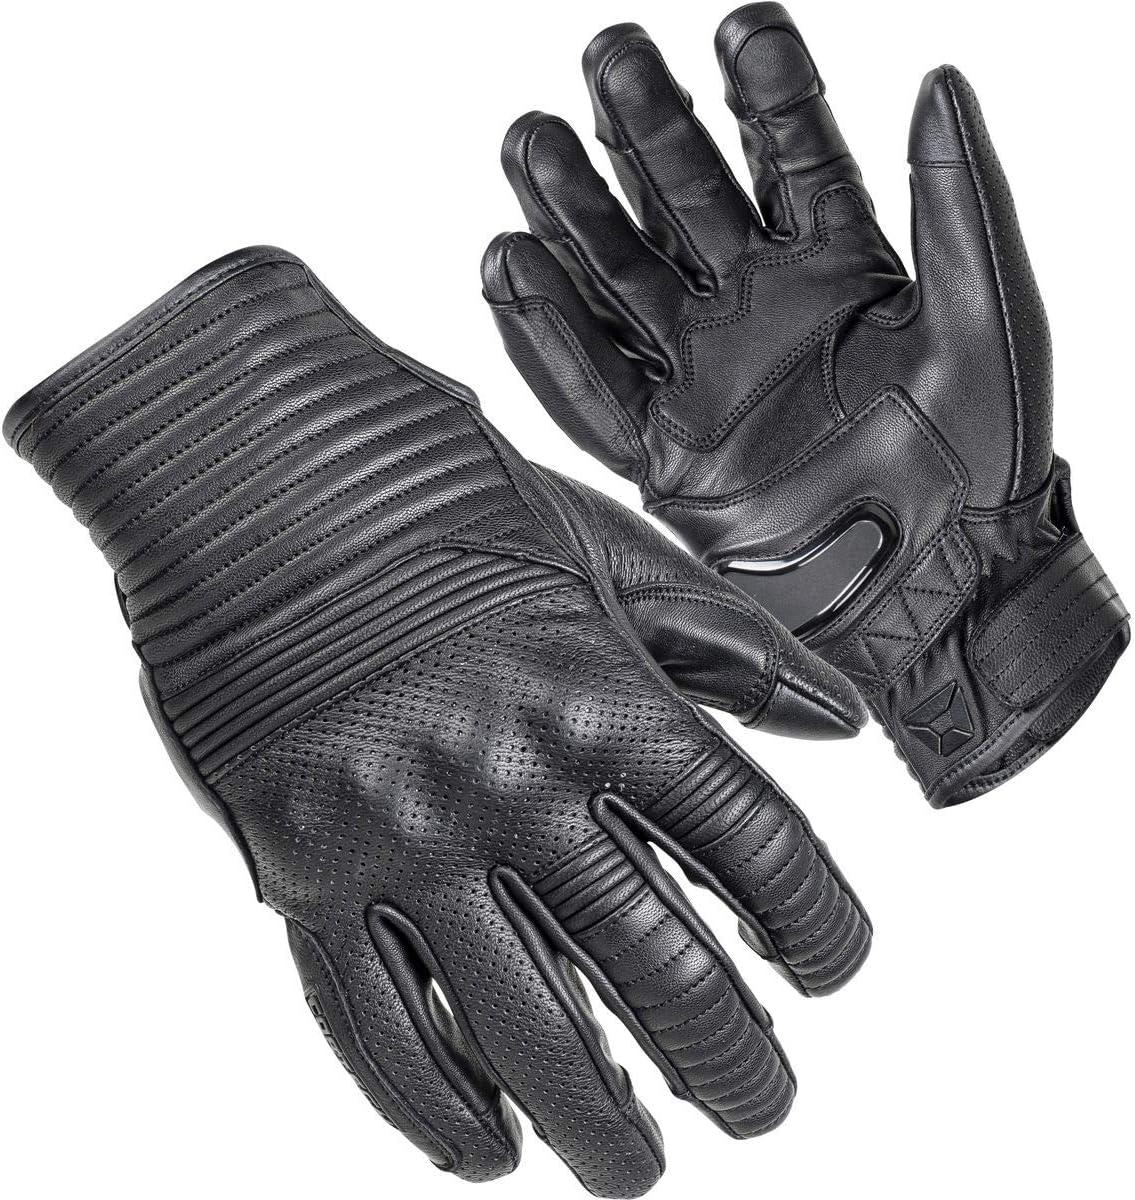 Cortech Max 43% OFF BLVD Bully Leather Superlatite Gloves Small Black